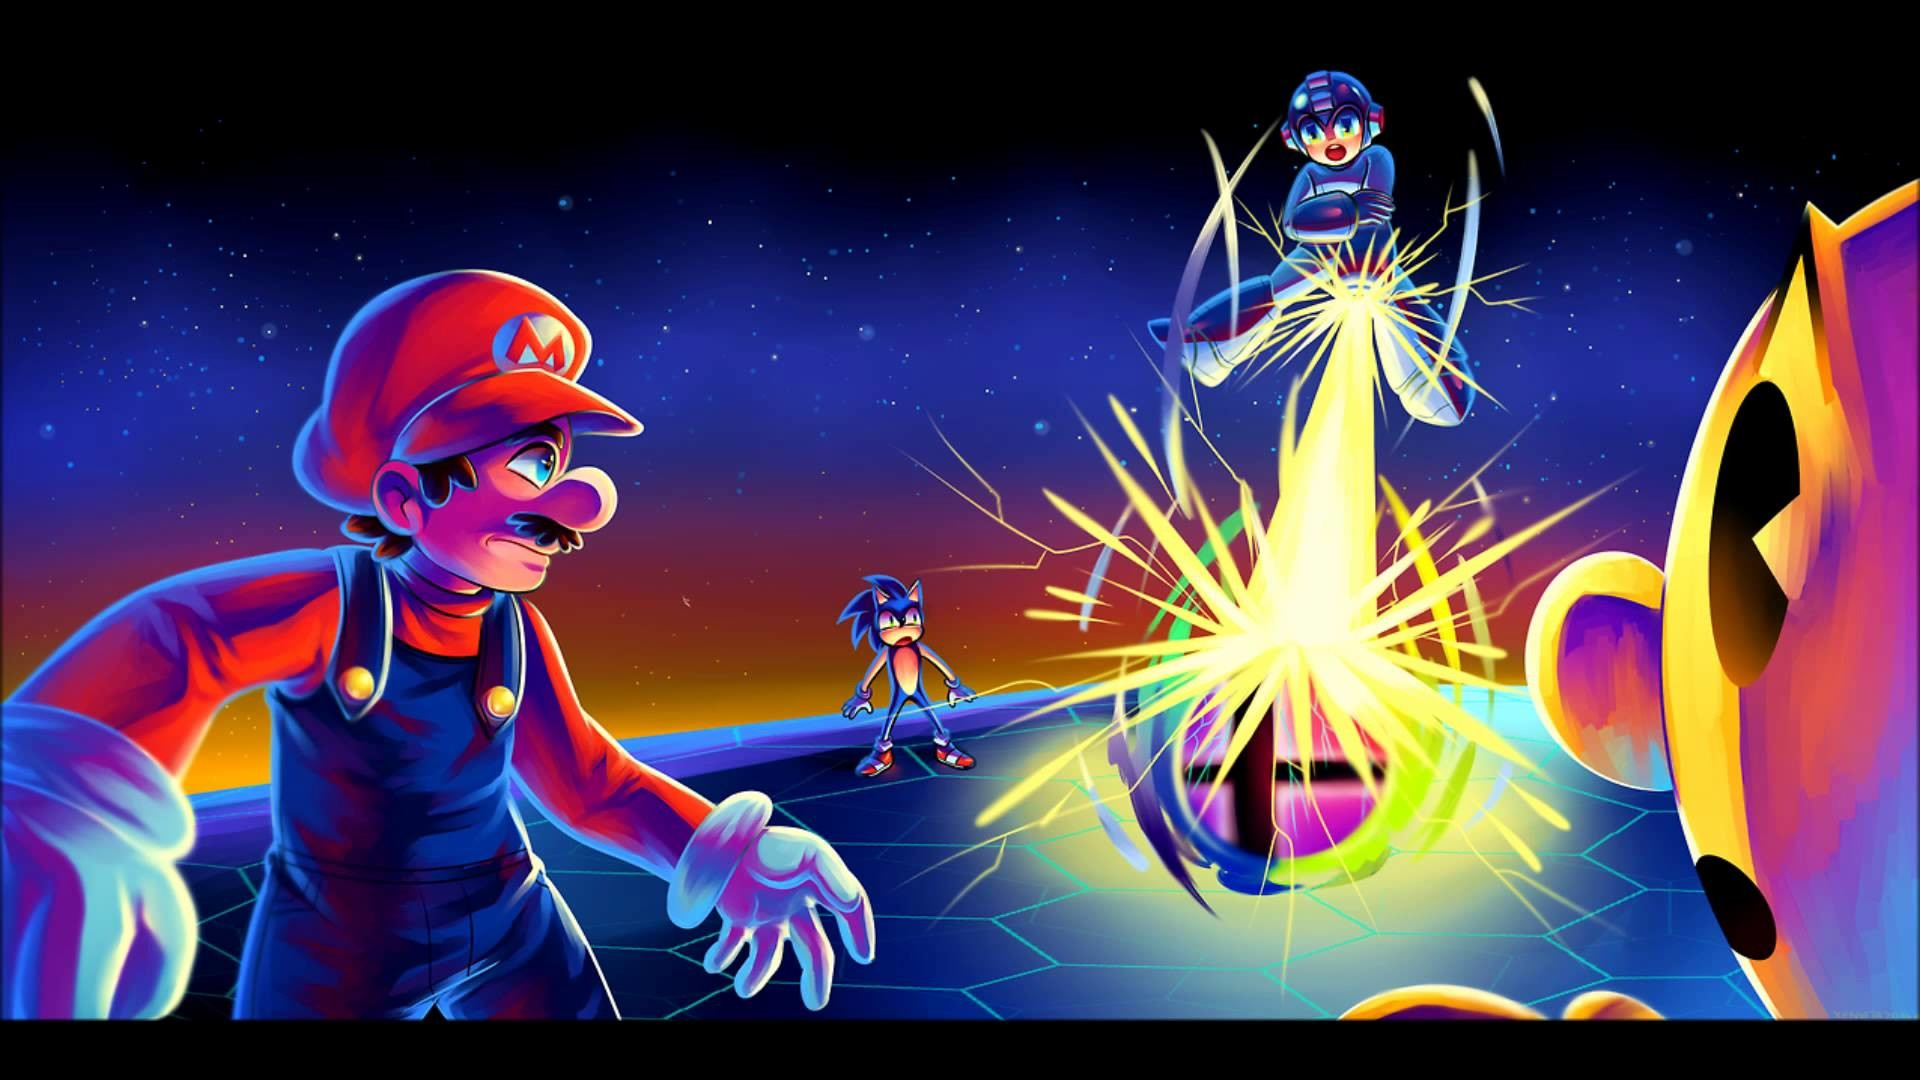 Super Smash Bros. Melee: Fountain of Dreams Remix